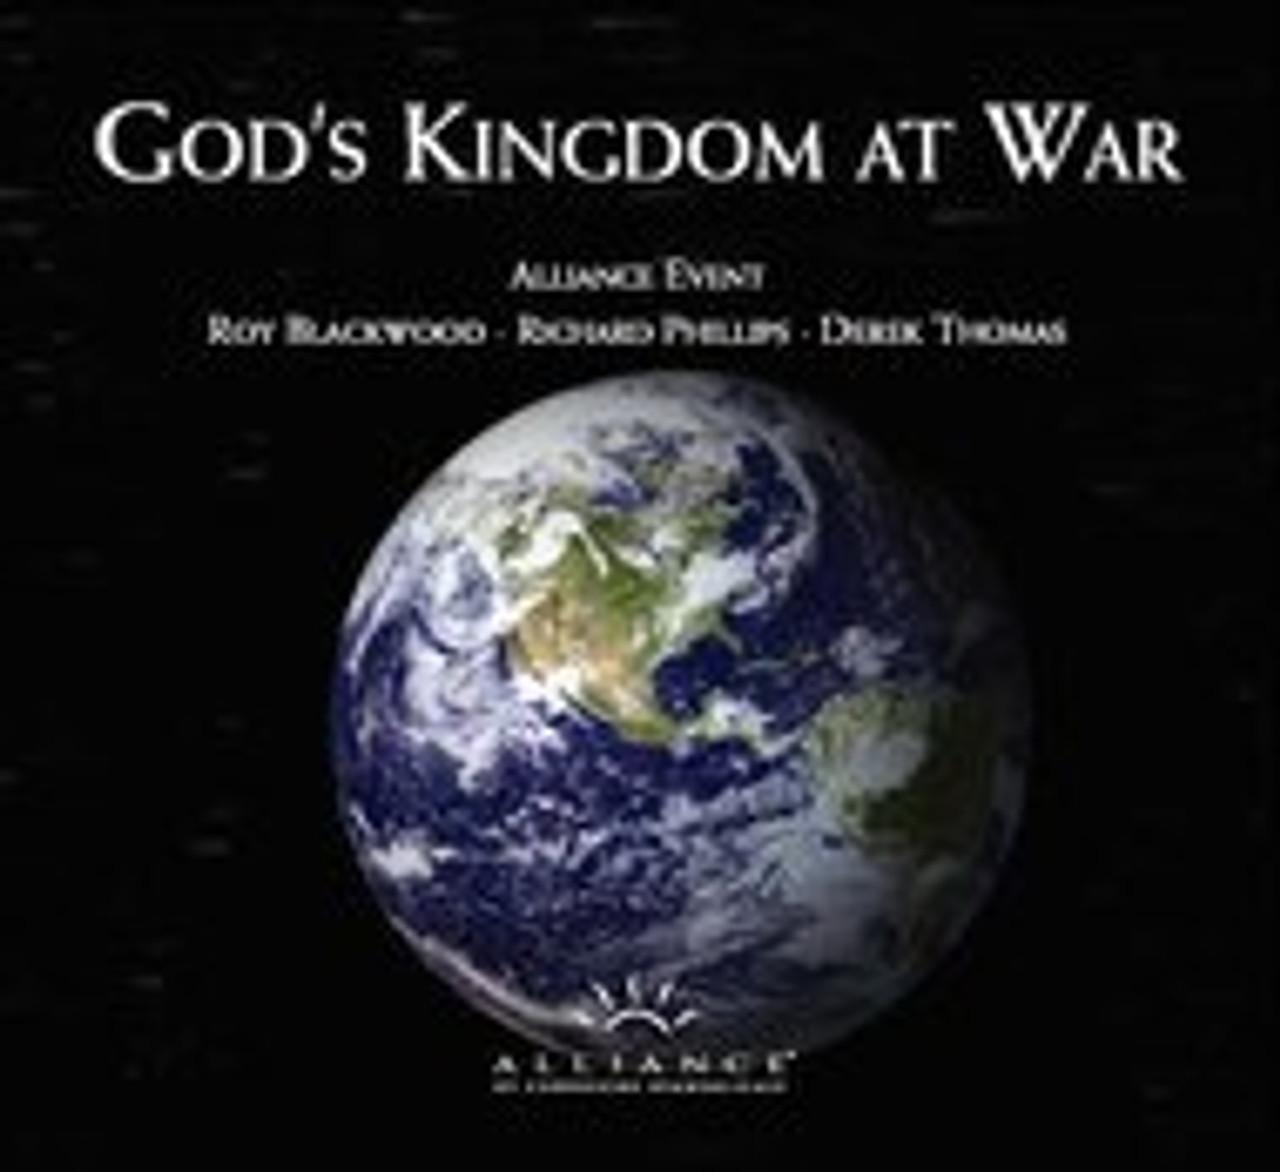 God's Kingdom at War (Derek Thomas)(mp3 Download)